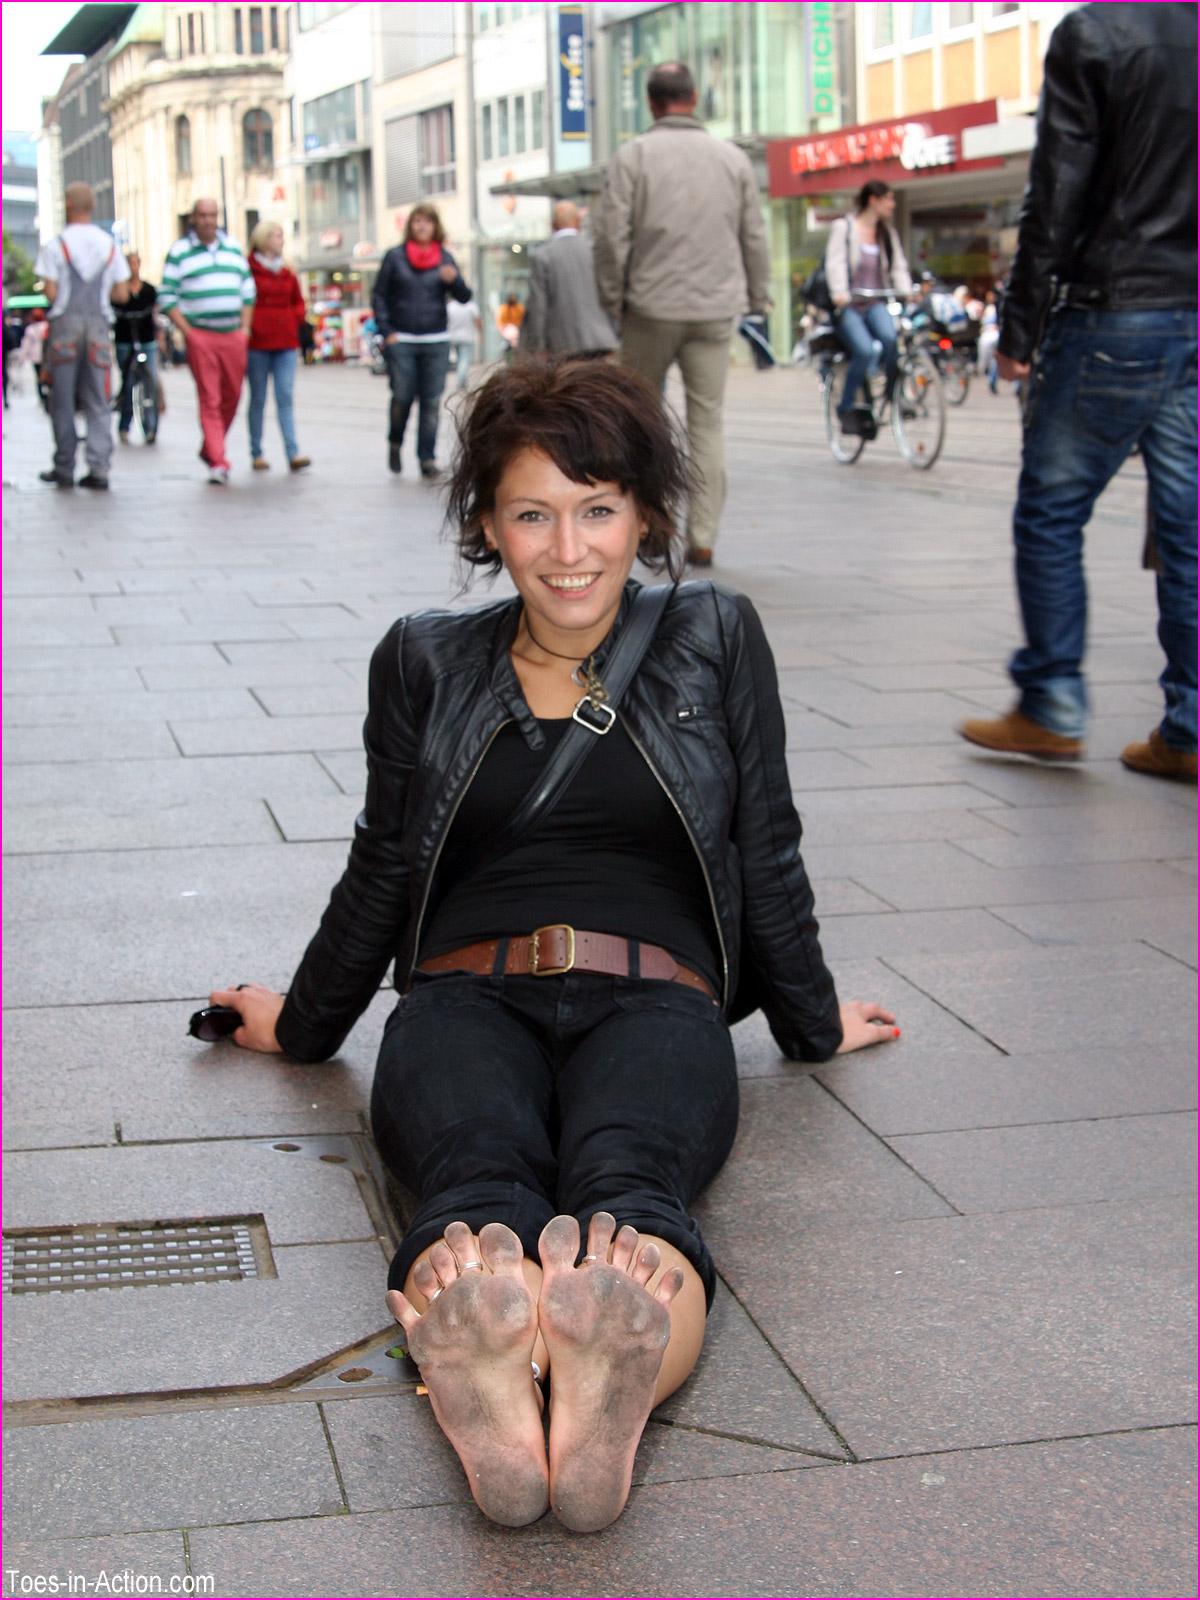 Wu's Feet Links - Dirty Soles Shopping Spree